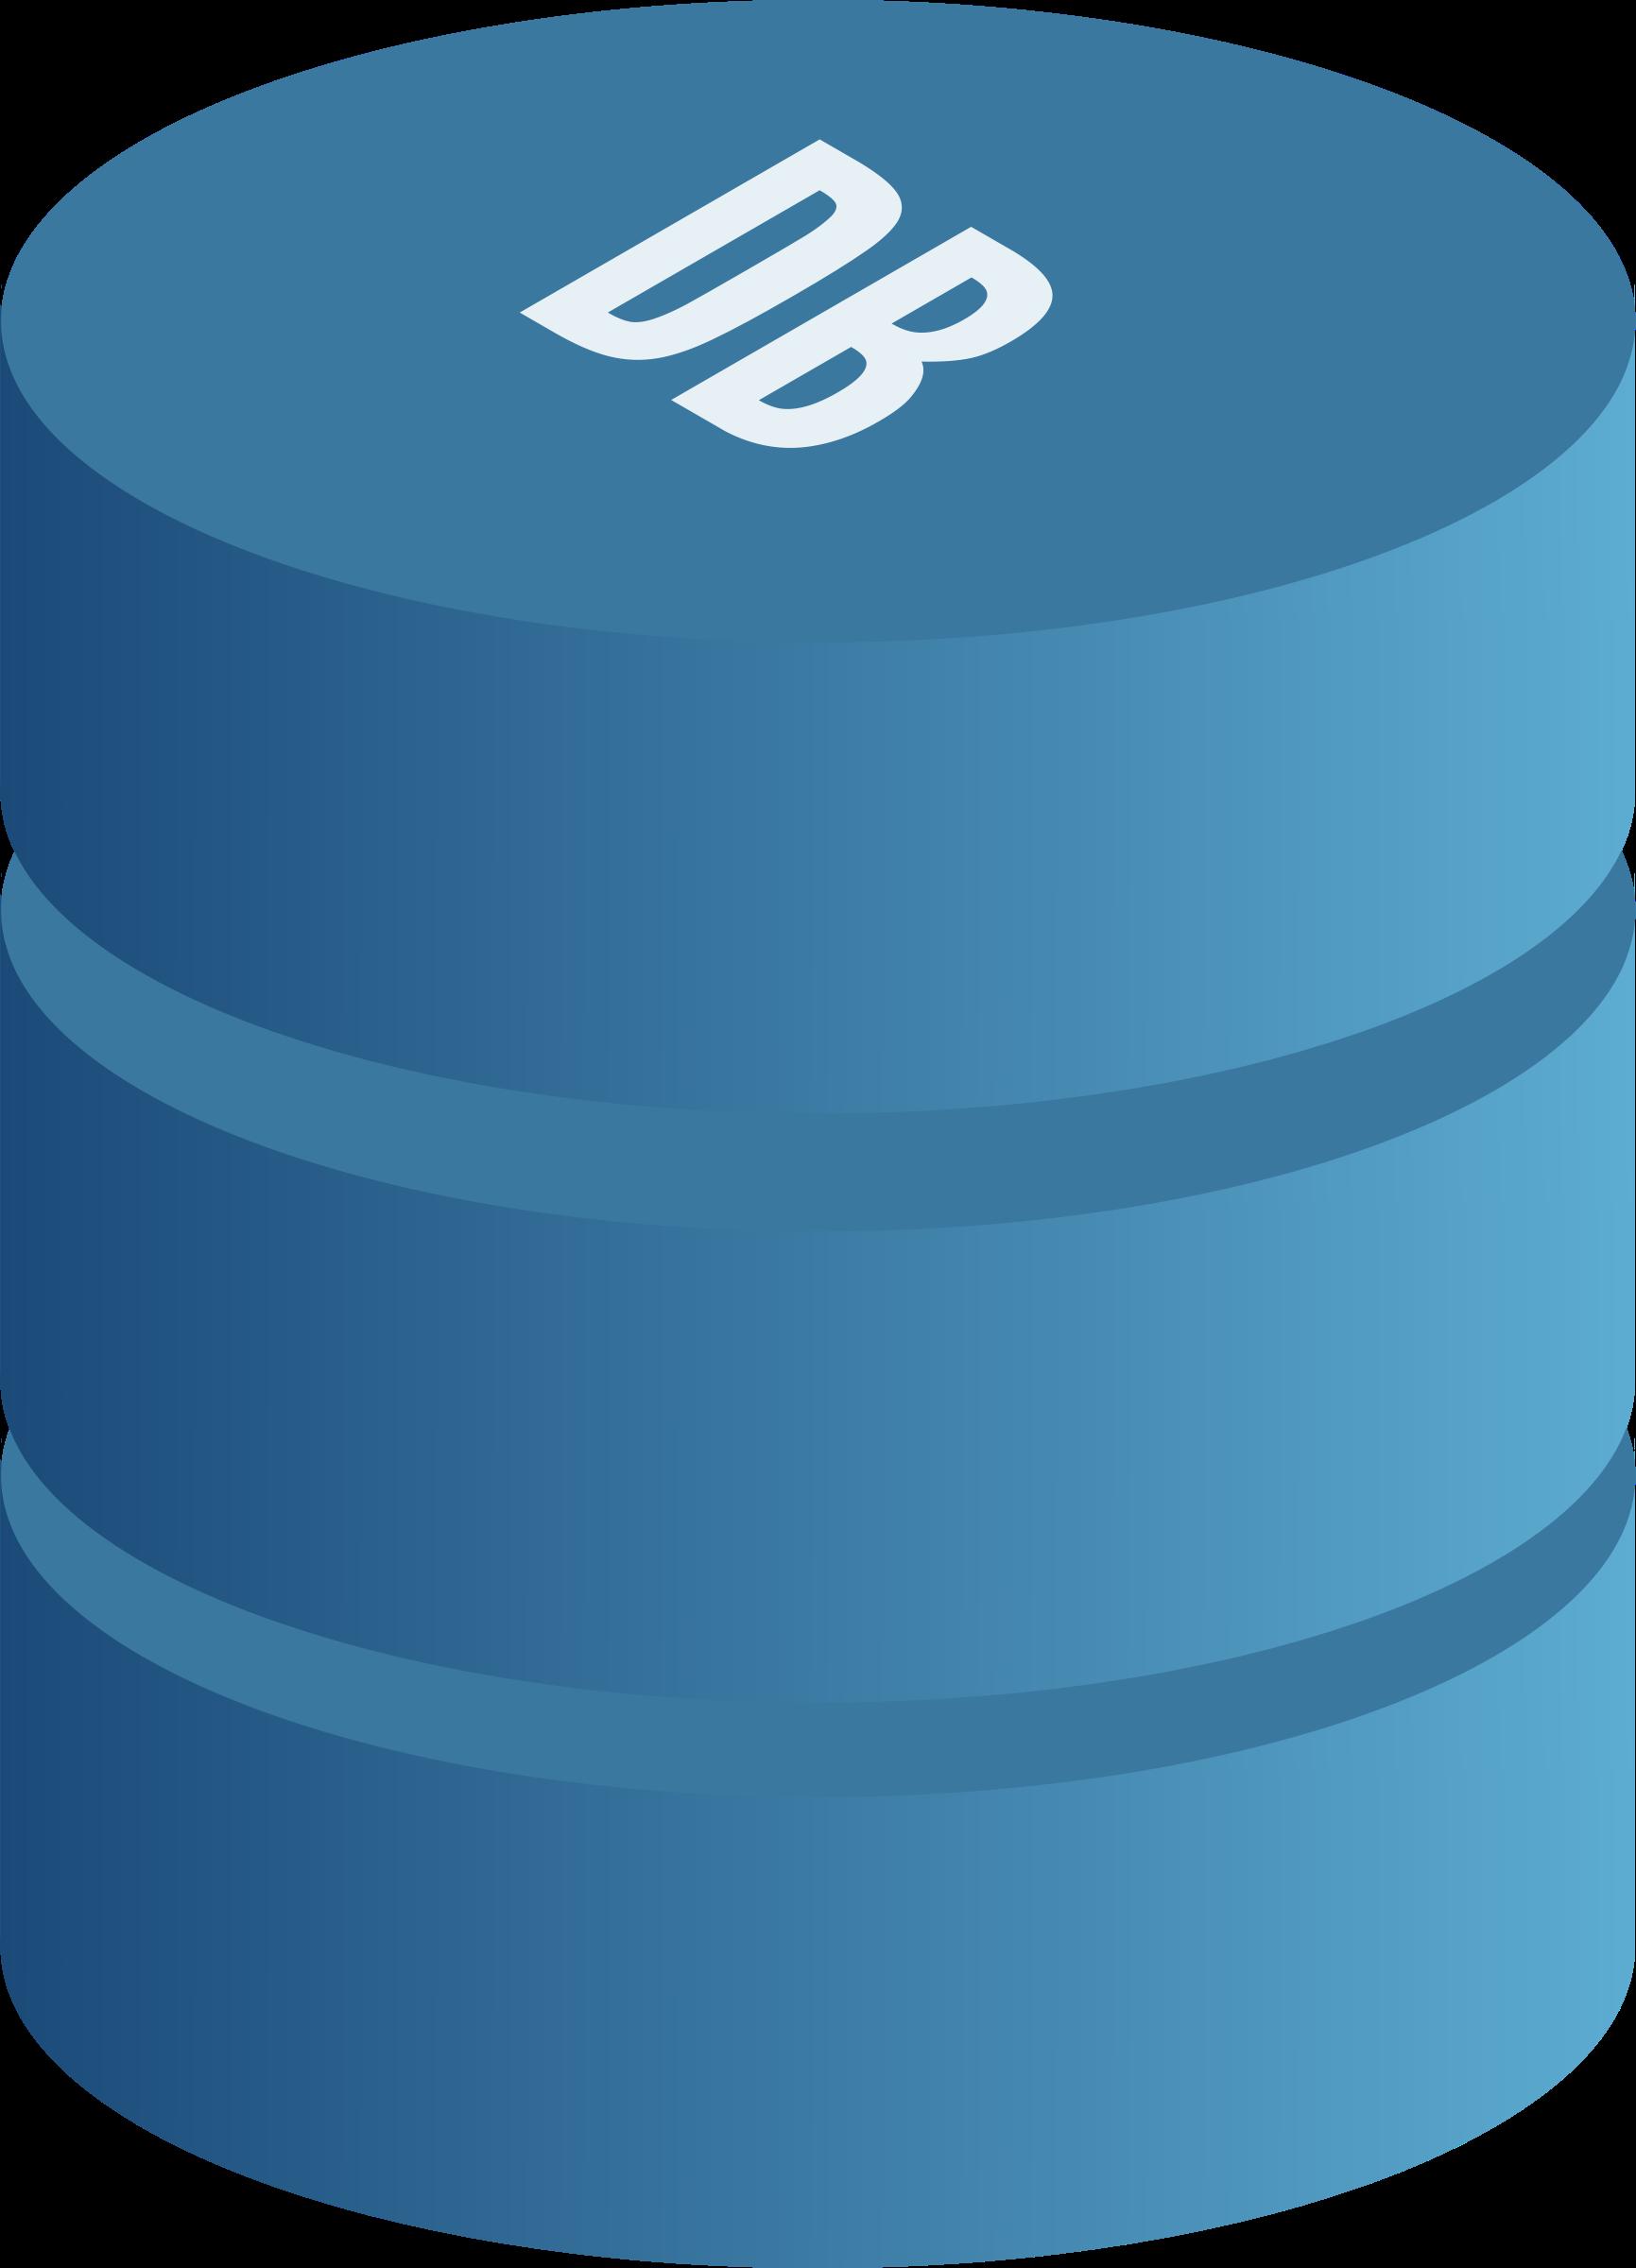 Clipart Database & Database Clip Art Images.